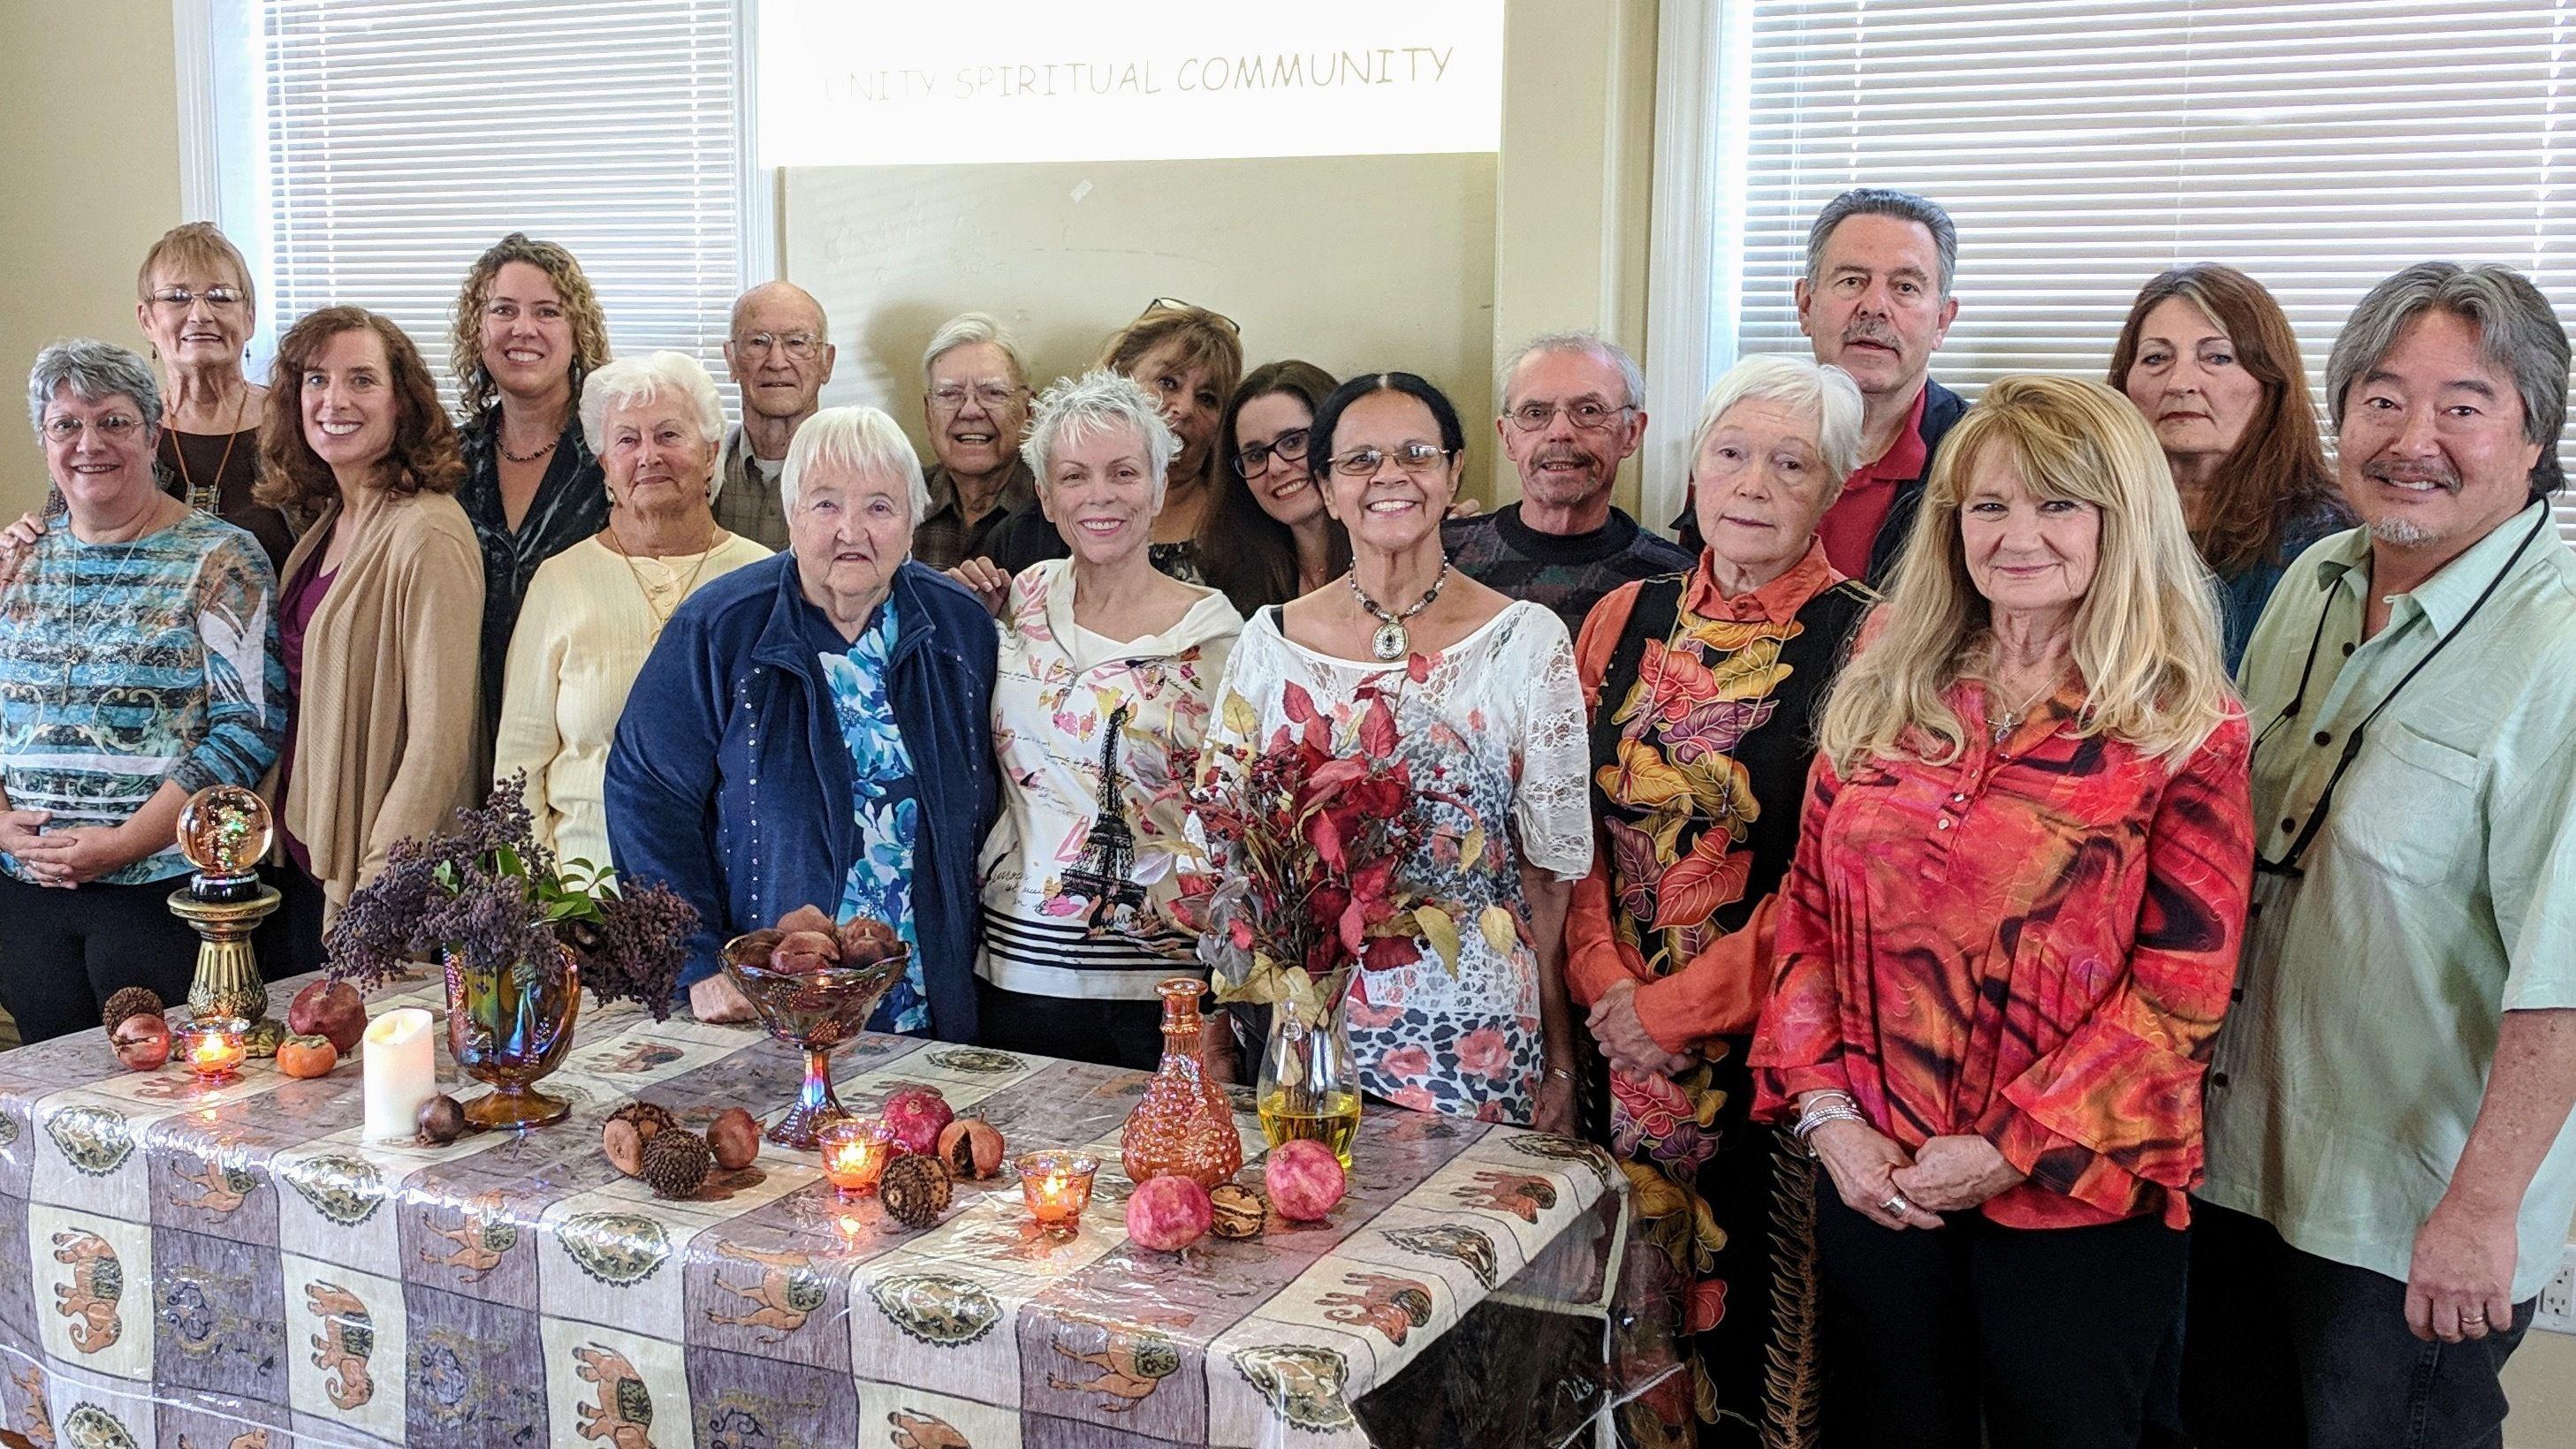 Unity Spiritual Community in Citrus Heights